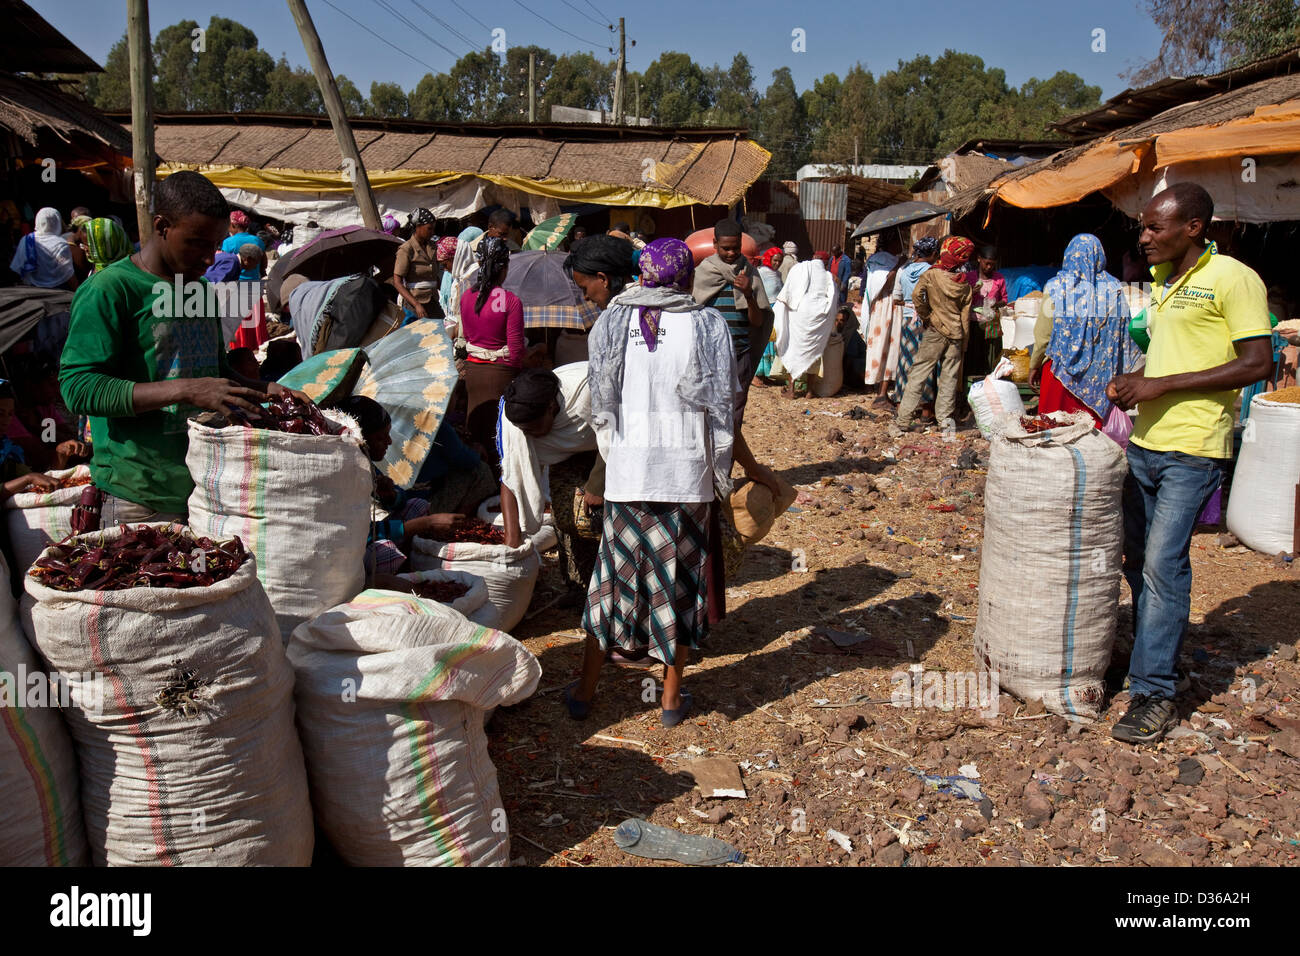 The Saturday Market, Bahir Dar, Ethiopia - Stock Image